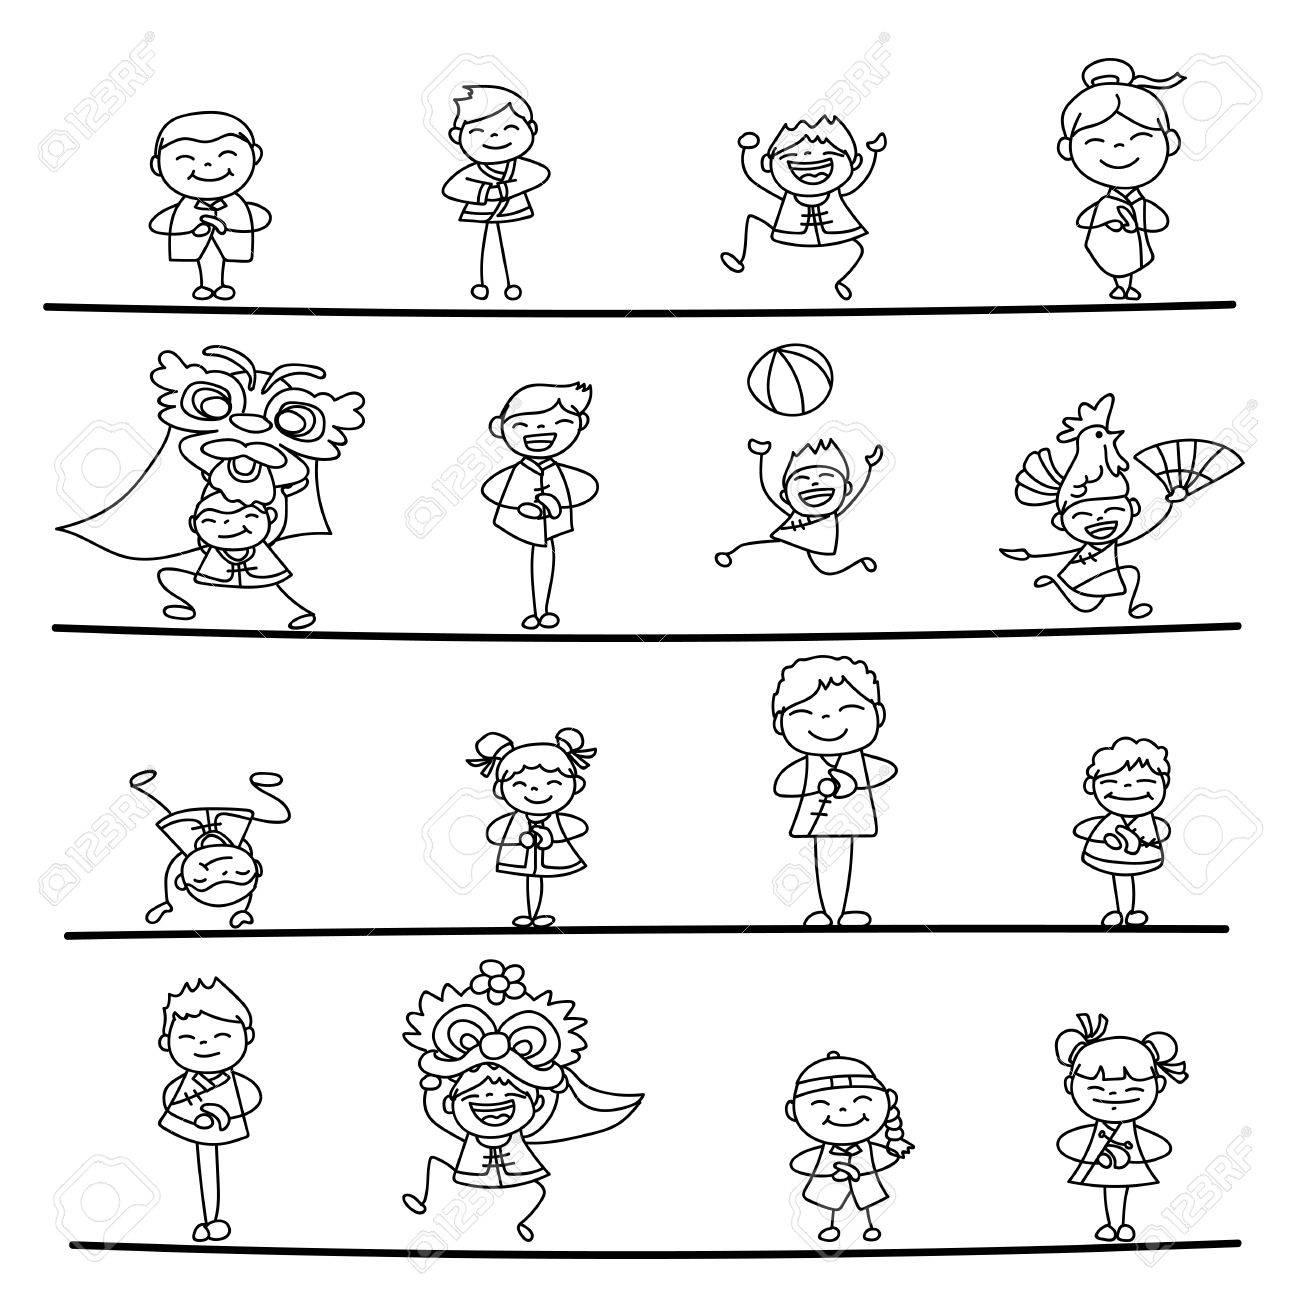 Conjunto De La Mano De Dibujo De Personajes De Dibujos Animados ...